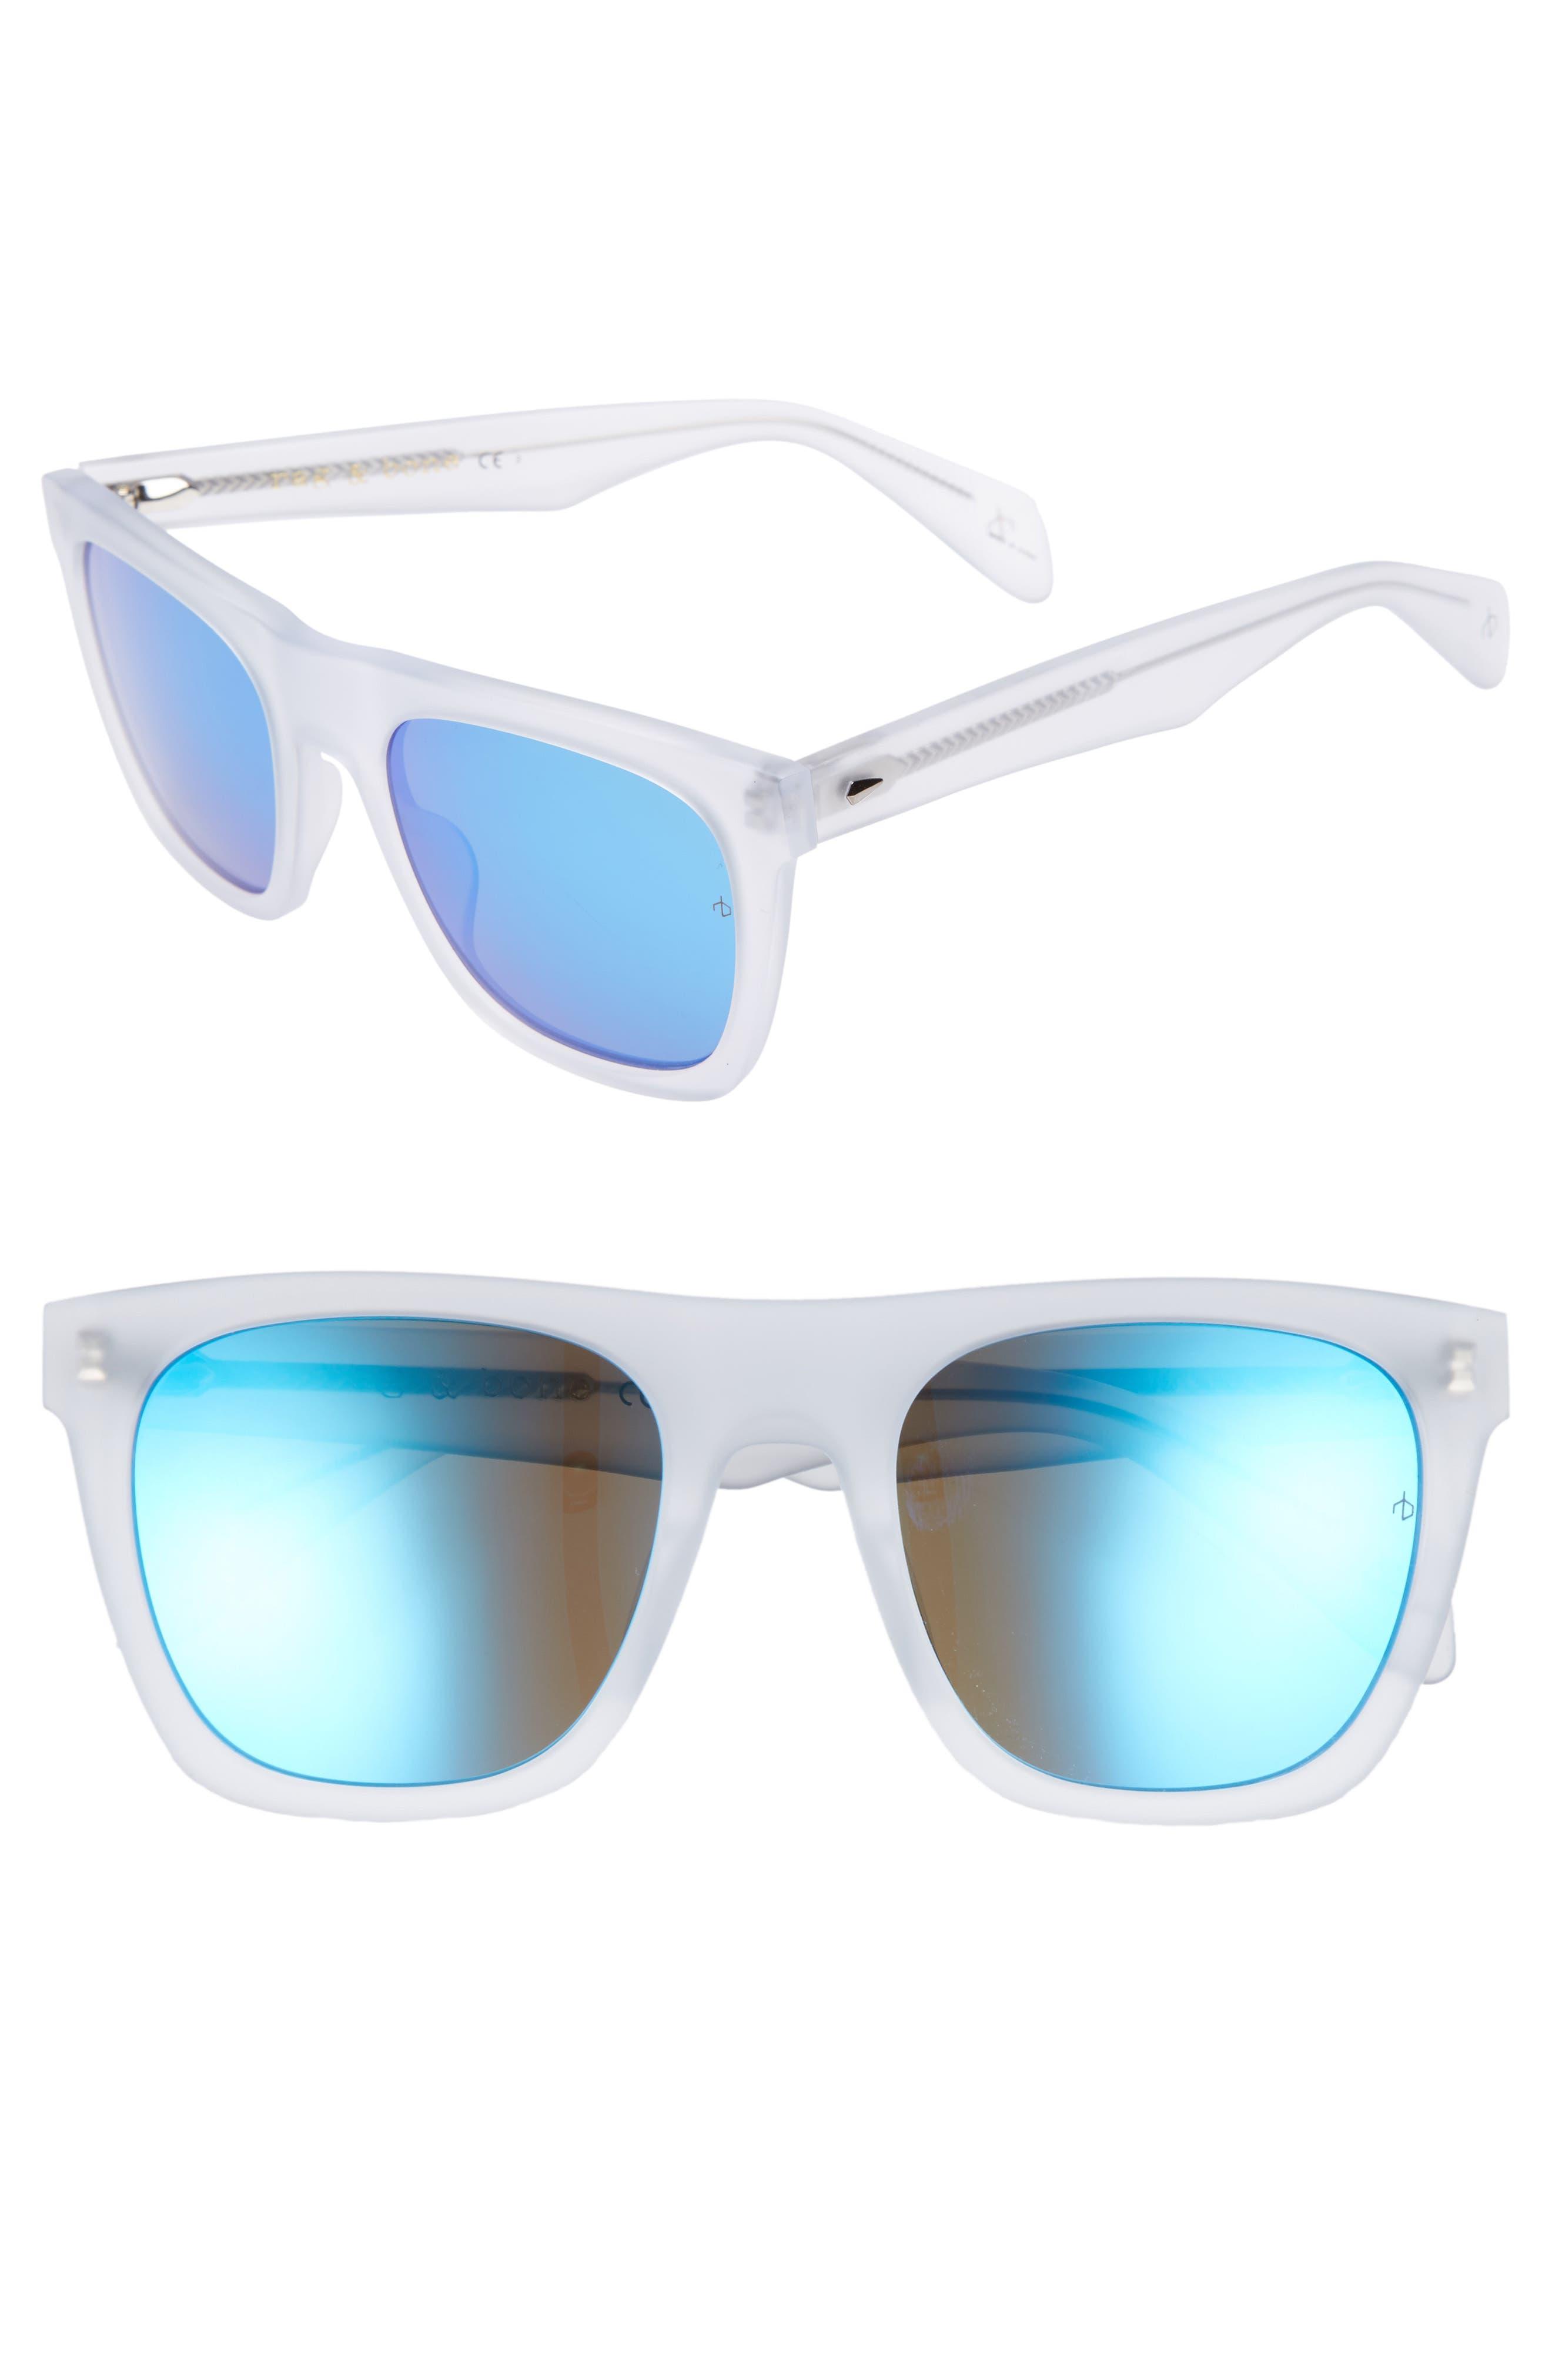 RAG & BONE, 54mm Polarized Sunglasses, Main thumbnail 1, color, MATTE CRYSTAL